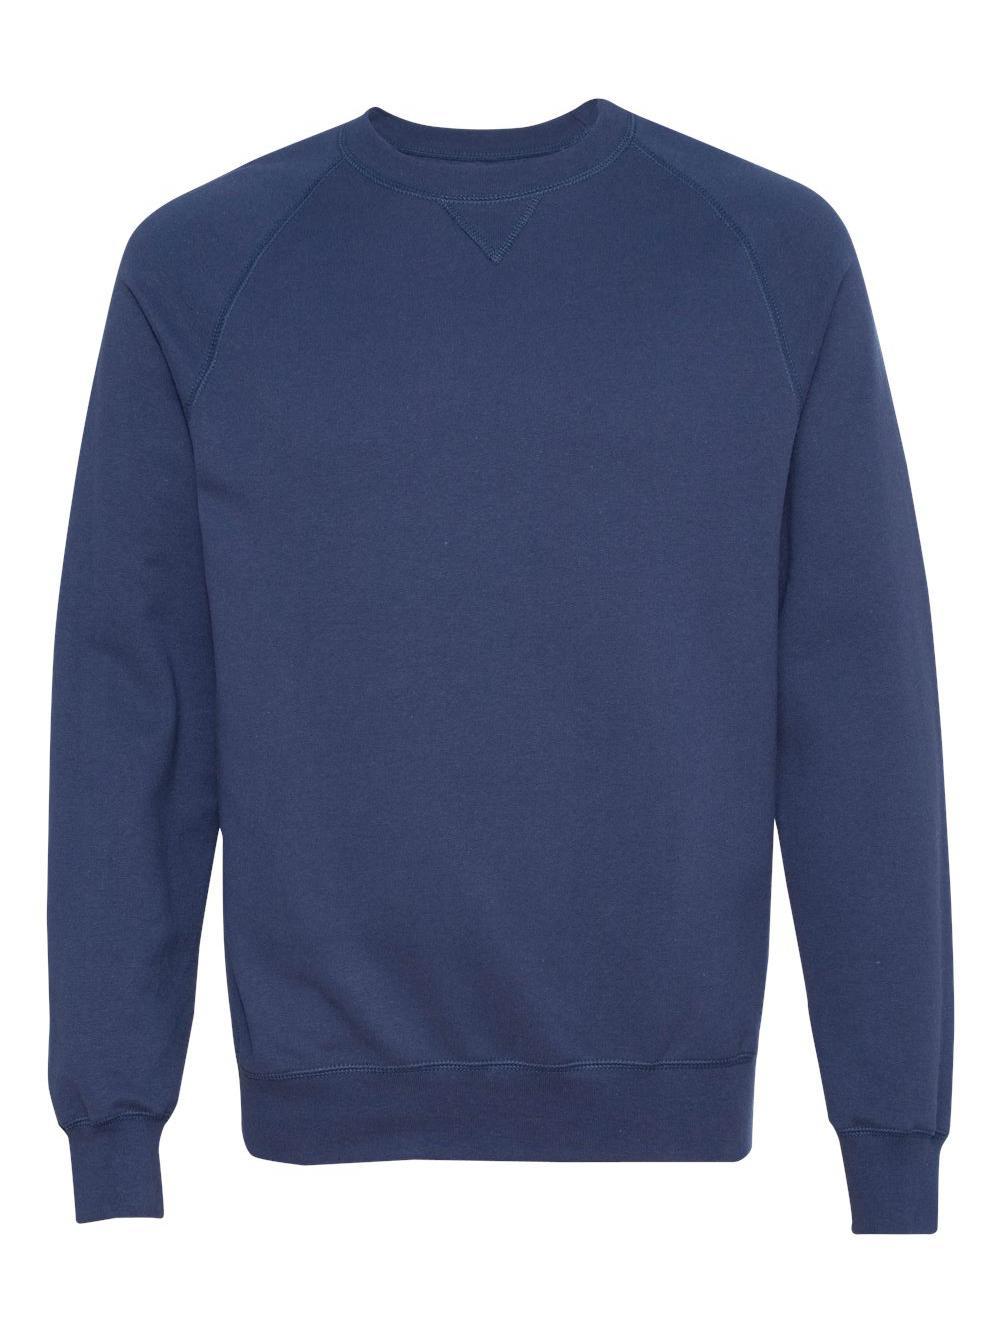 Hanes Mens Nano Premium Lightweight Crewneck Sweatshirt N260 Vintage ... 735a7f22a